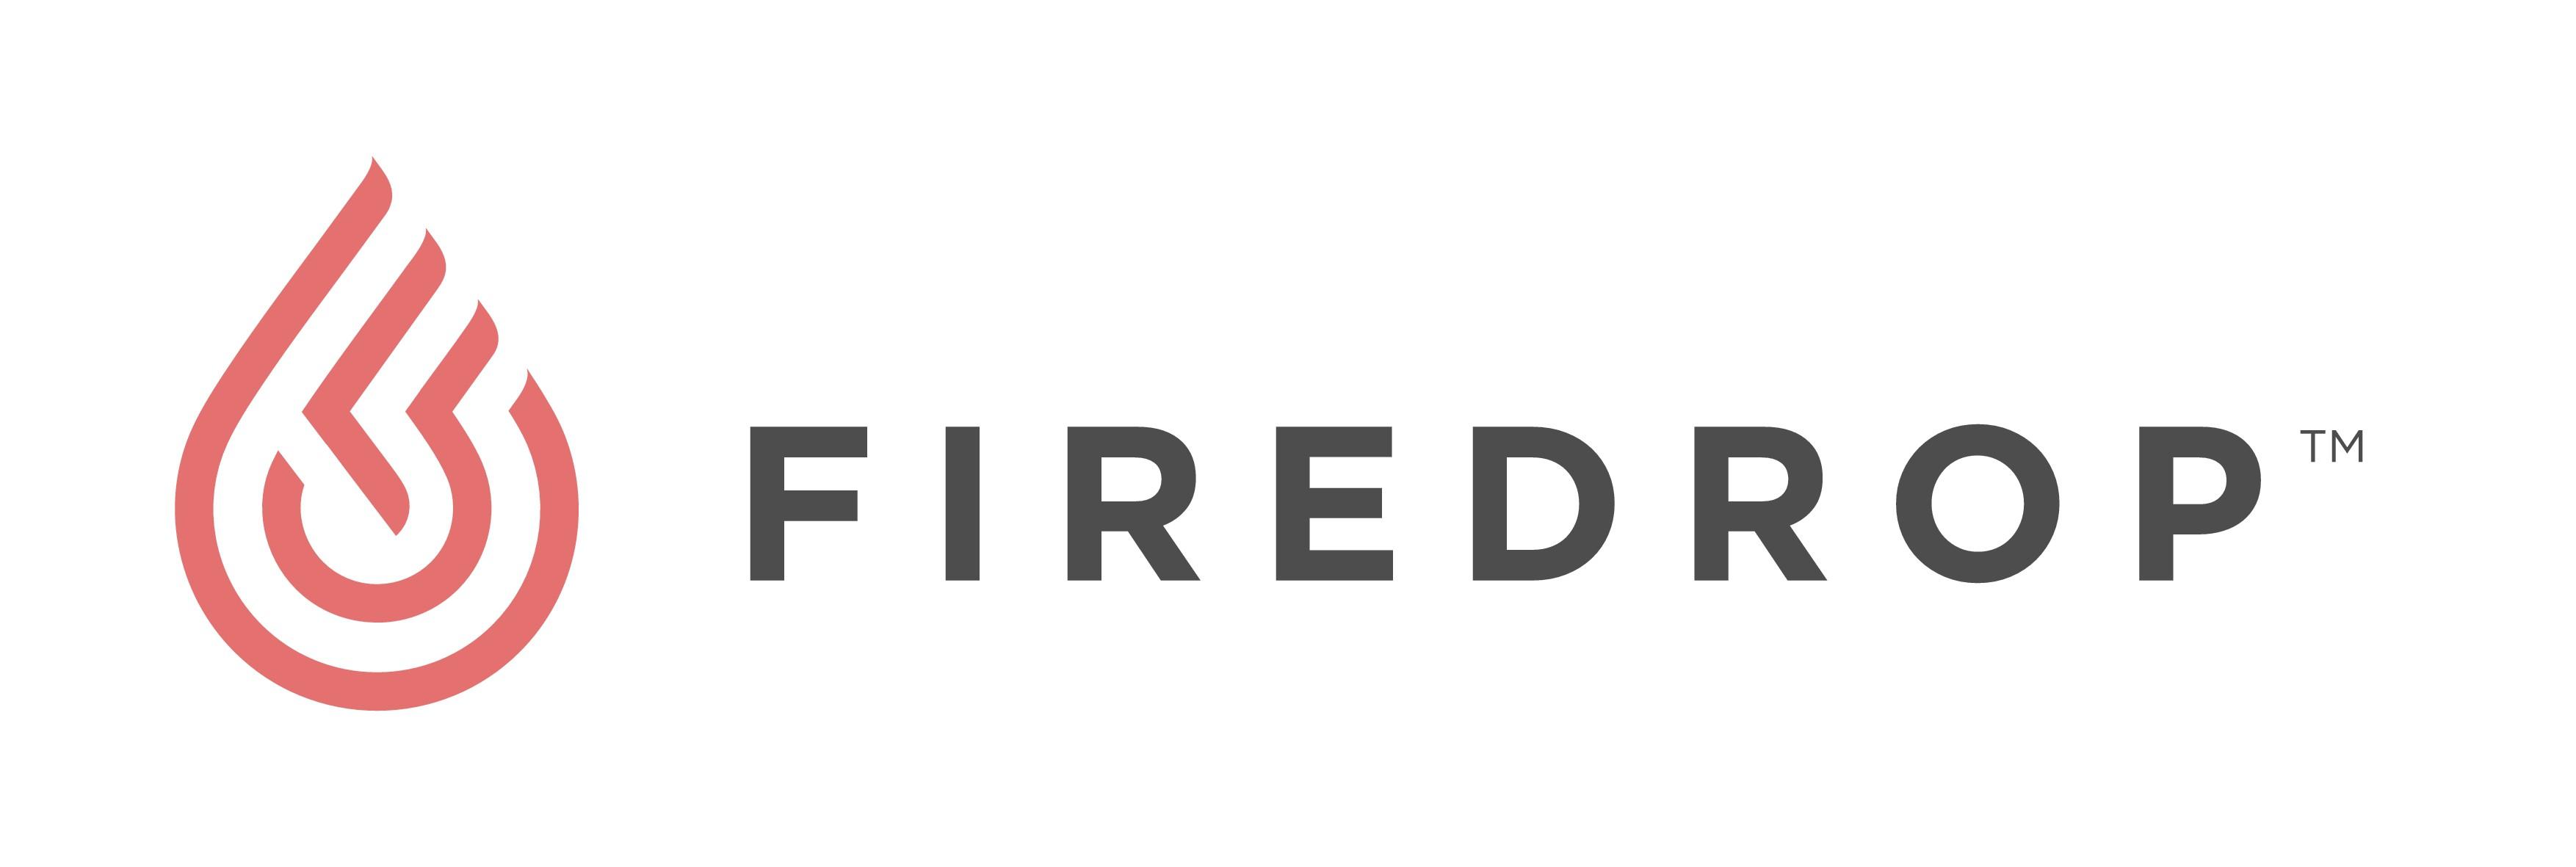 A modern logo for a cutting edge new artificial intelligence web app